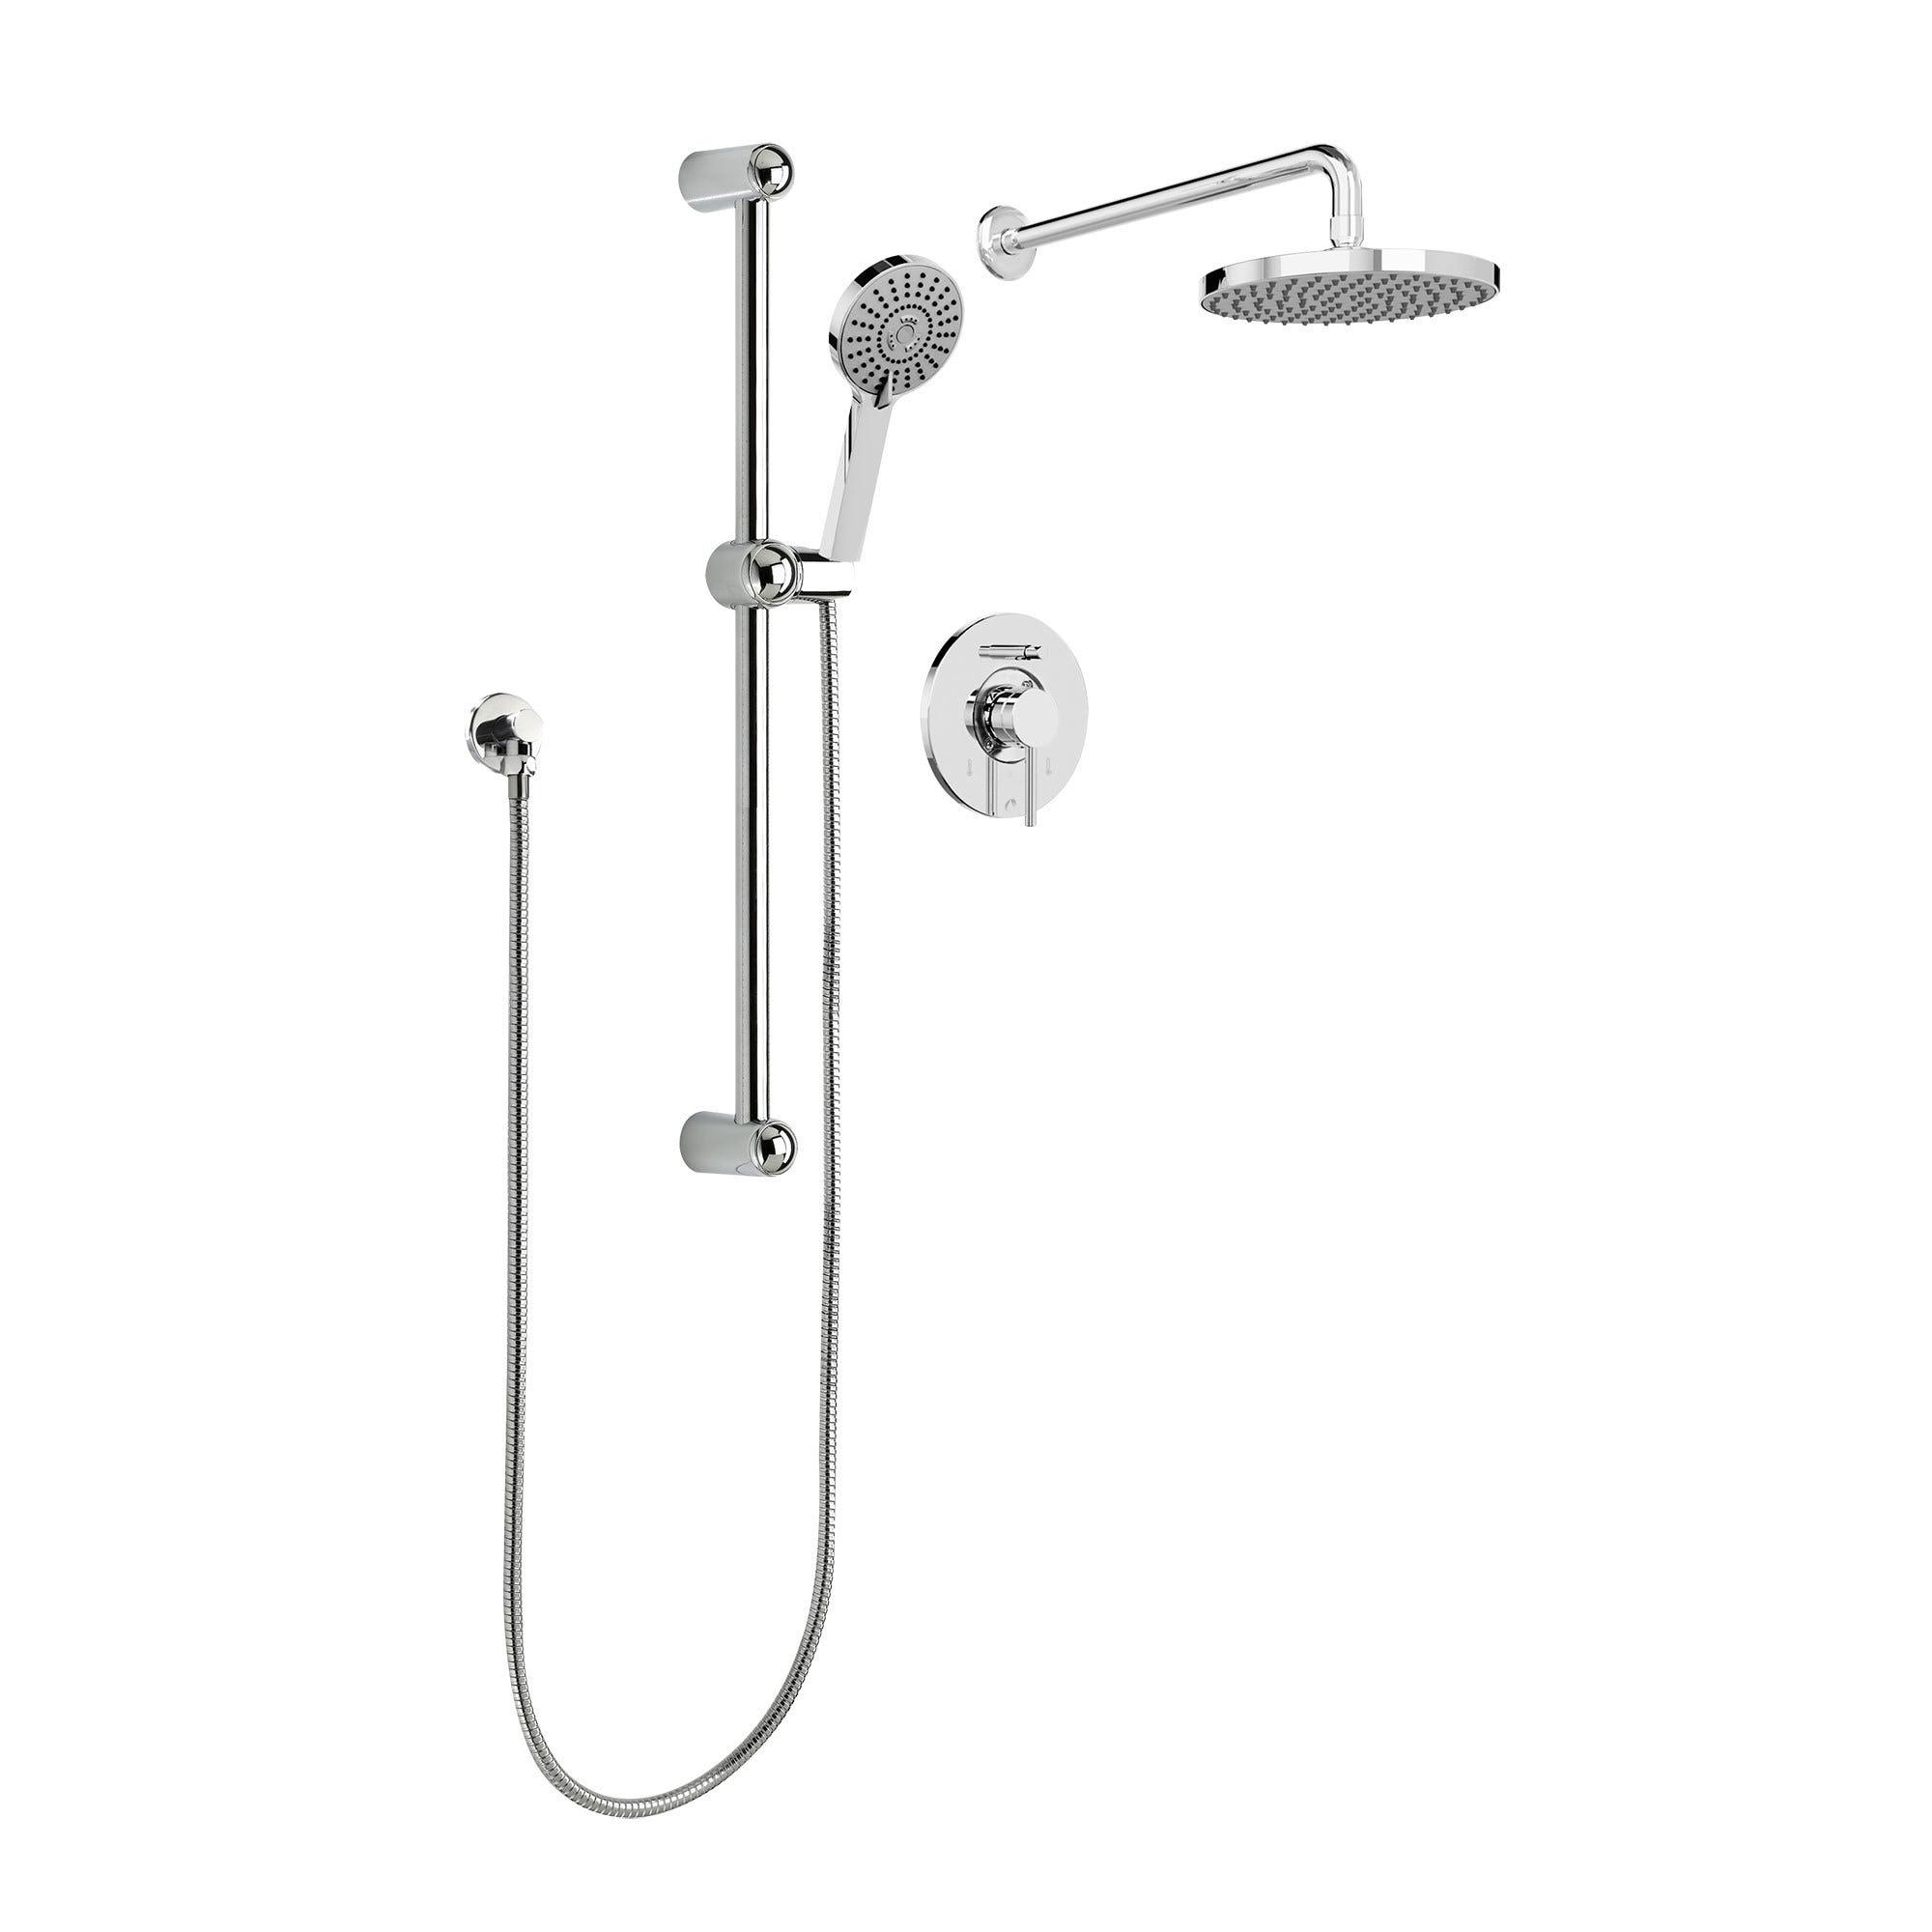 Sleek Round Rain Shower Faucet - Complete Set with Diverter Valve ...